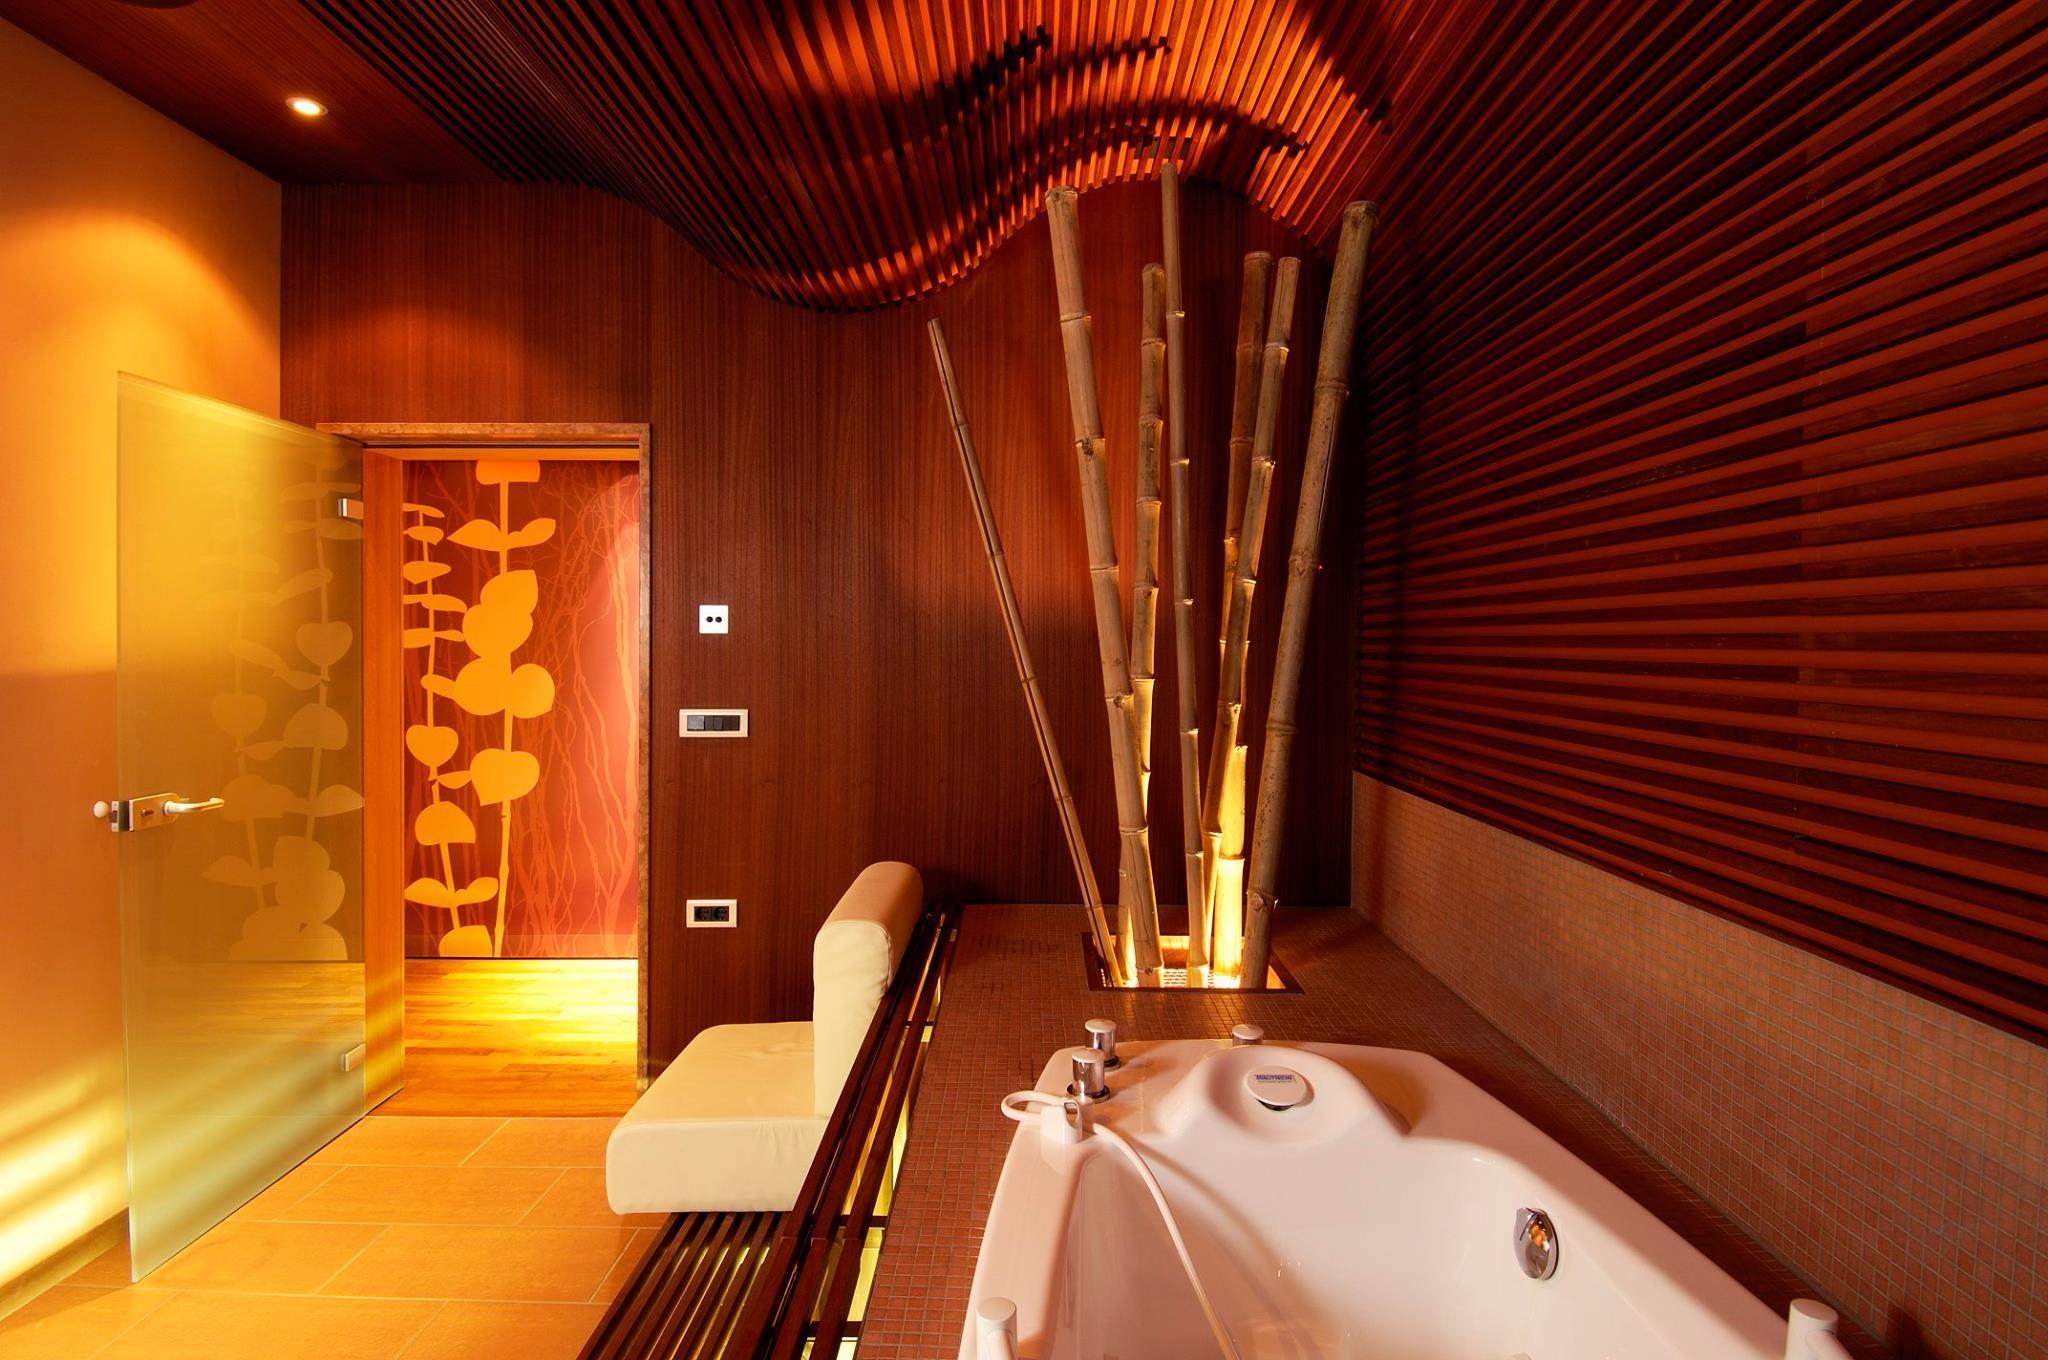 Hydrotherapie bad in het Sloveense spa resort Terme Smarjeske Toplice.